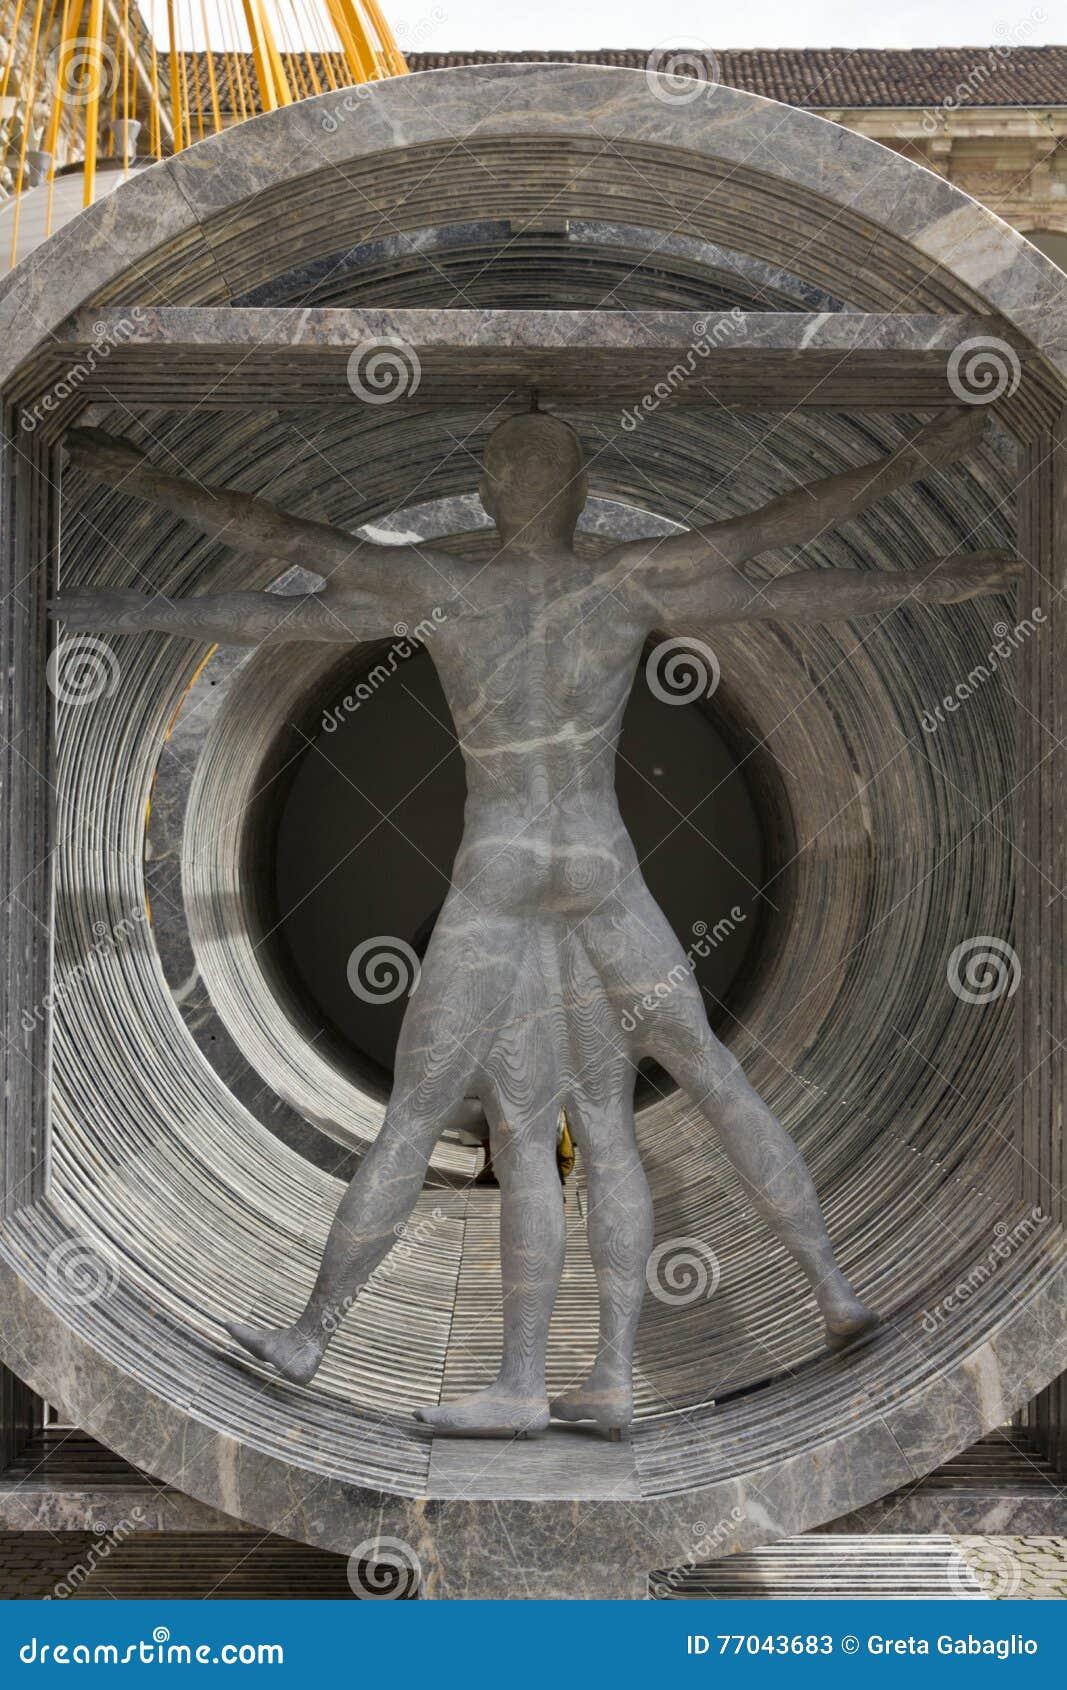 Vitruvian man made in marble